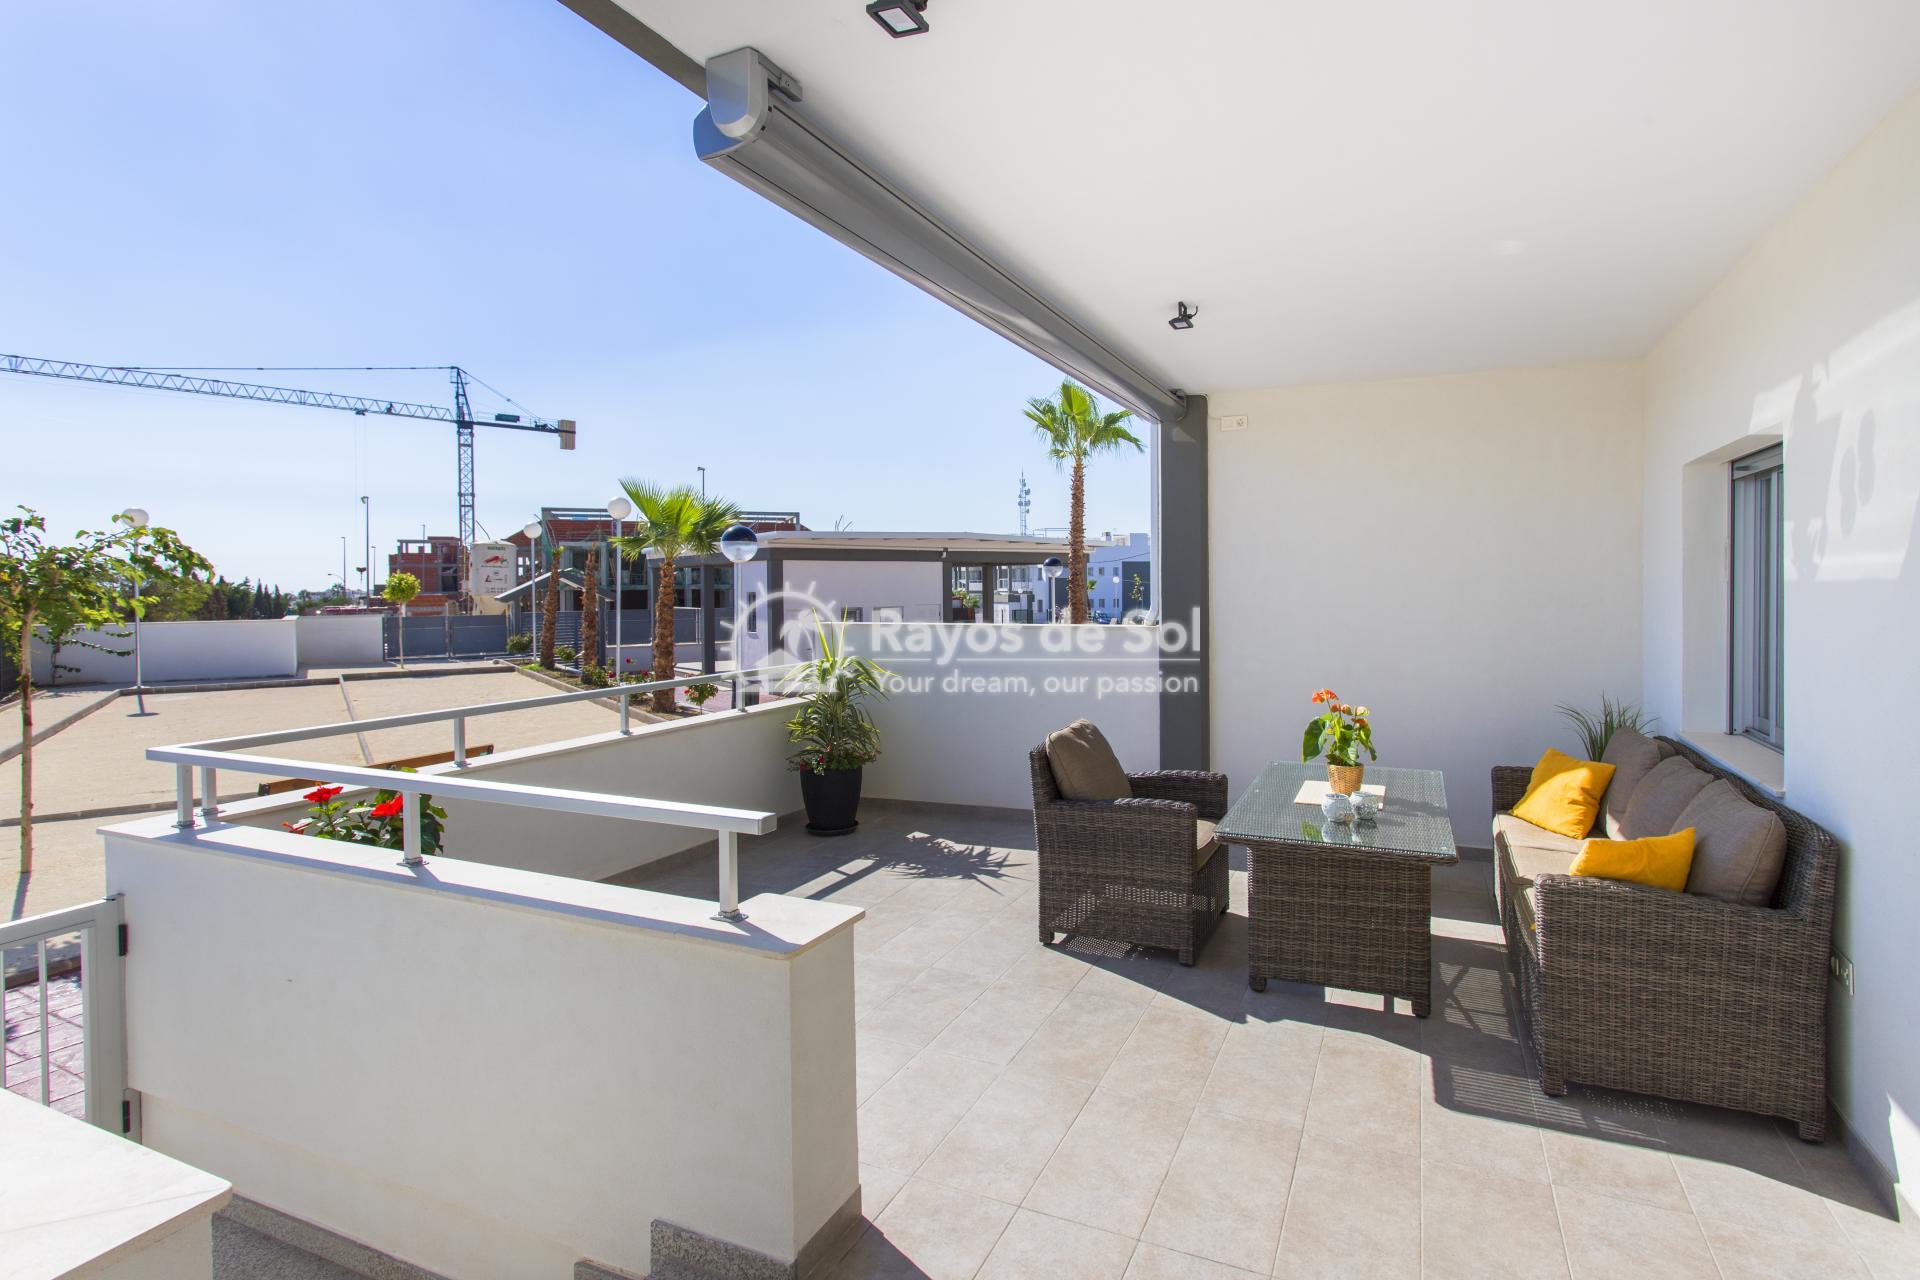 Appartement begane grond  in La Florida, Orihuela Costa, Costa Blanca (Oasis place BG3-2) - 17